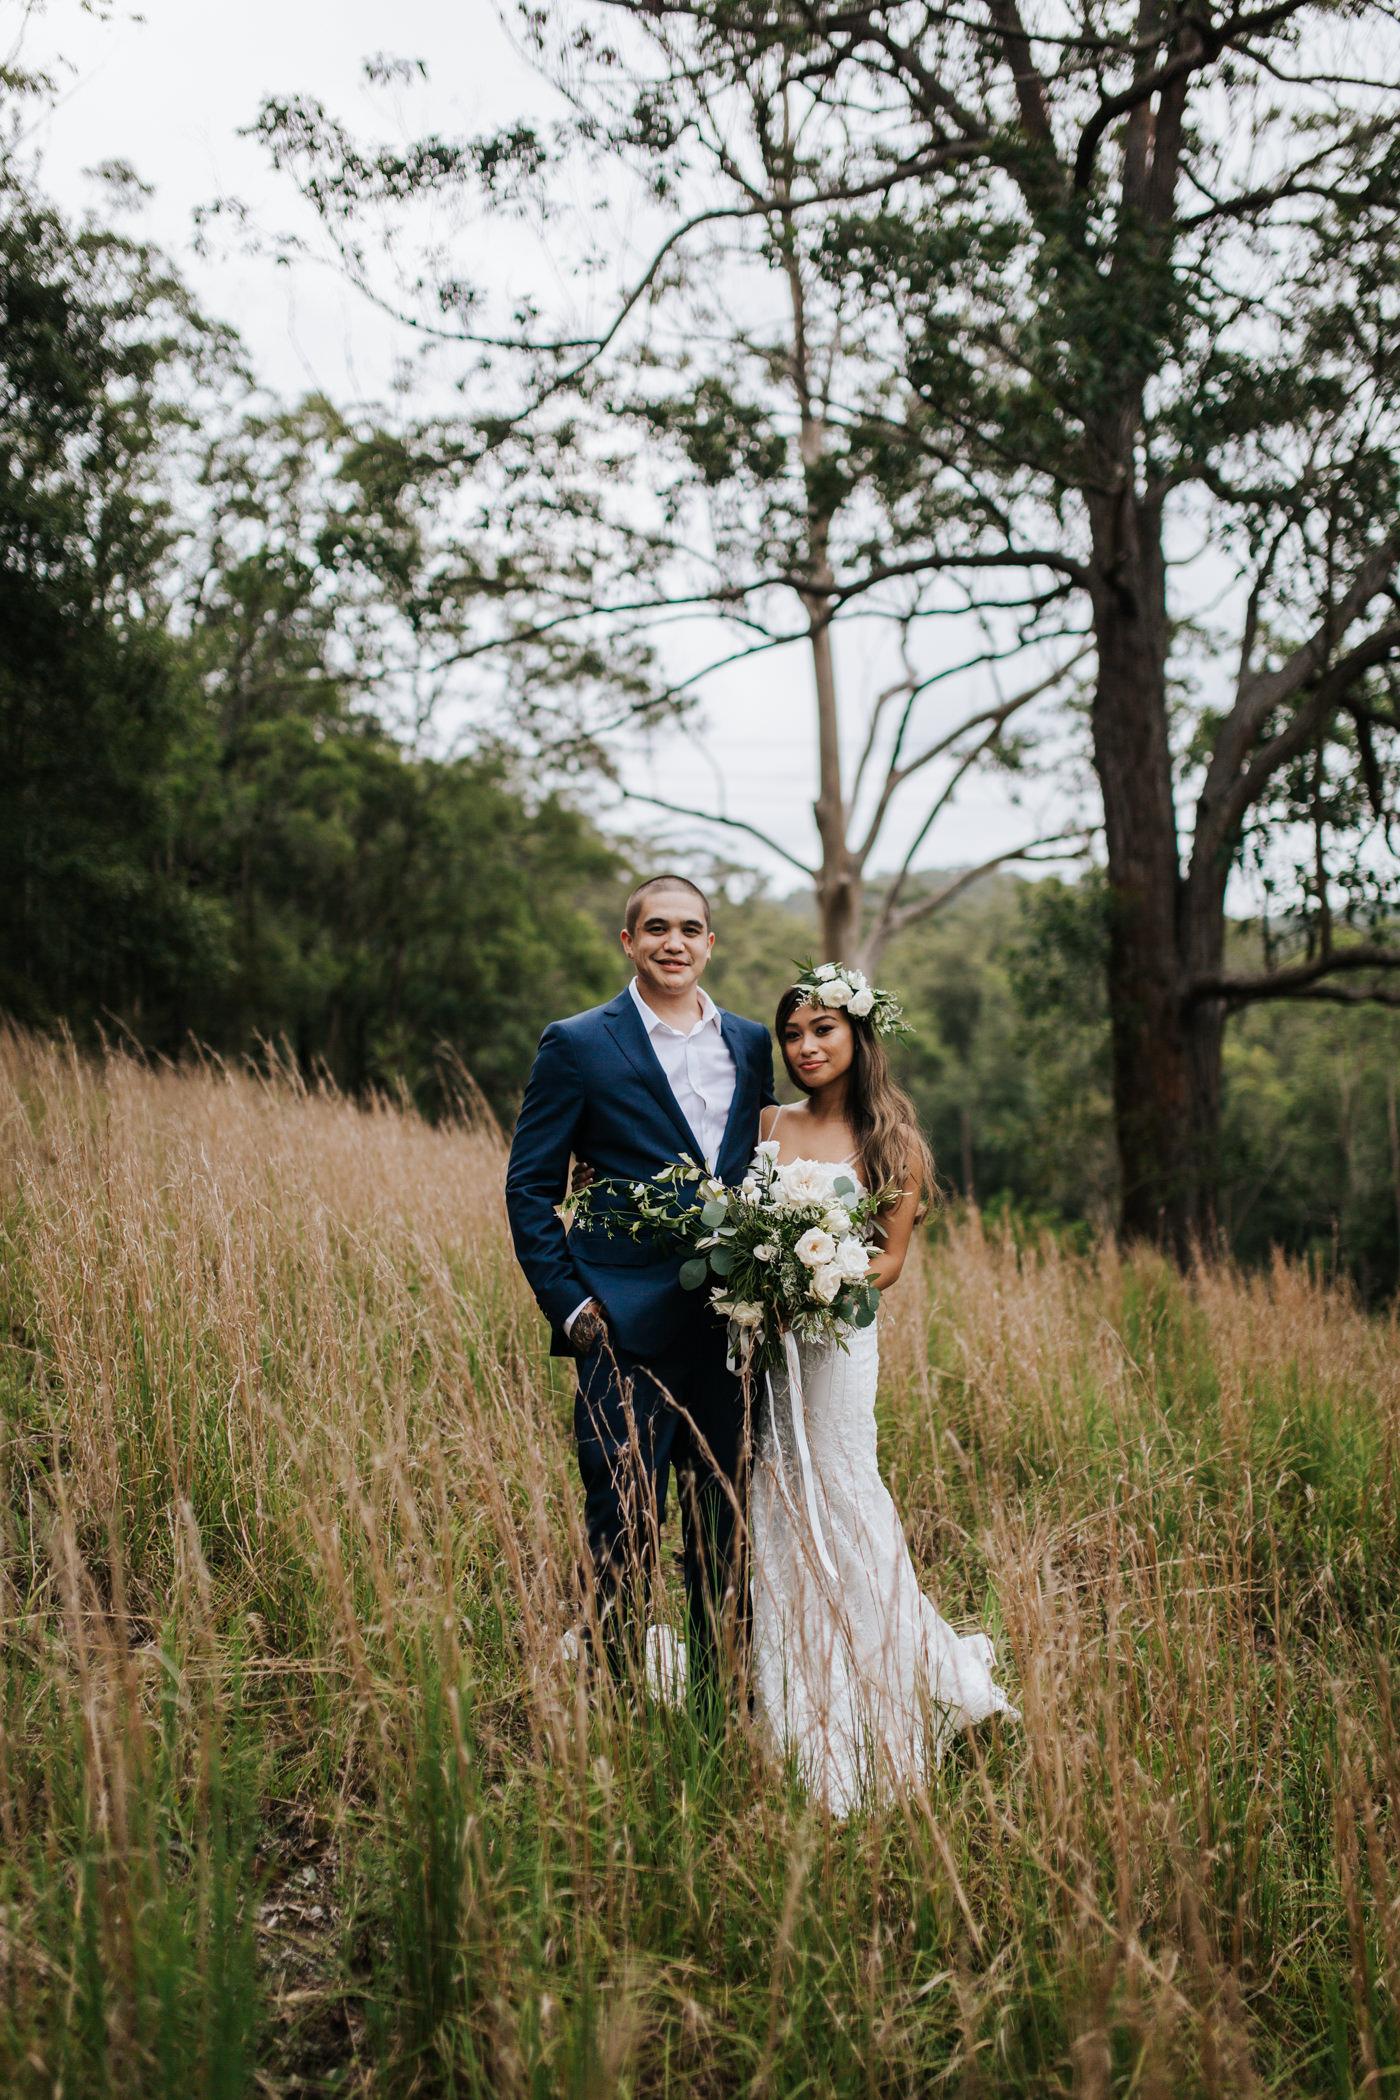 Nick & Vanezza - Fernbank Farm Wedding - Samantha Heather Photography-105.jpg